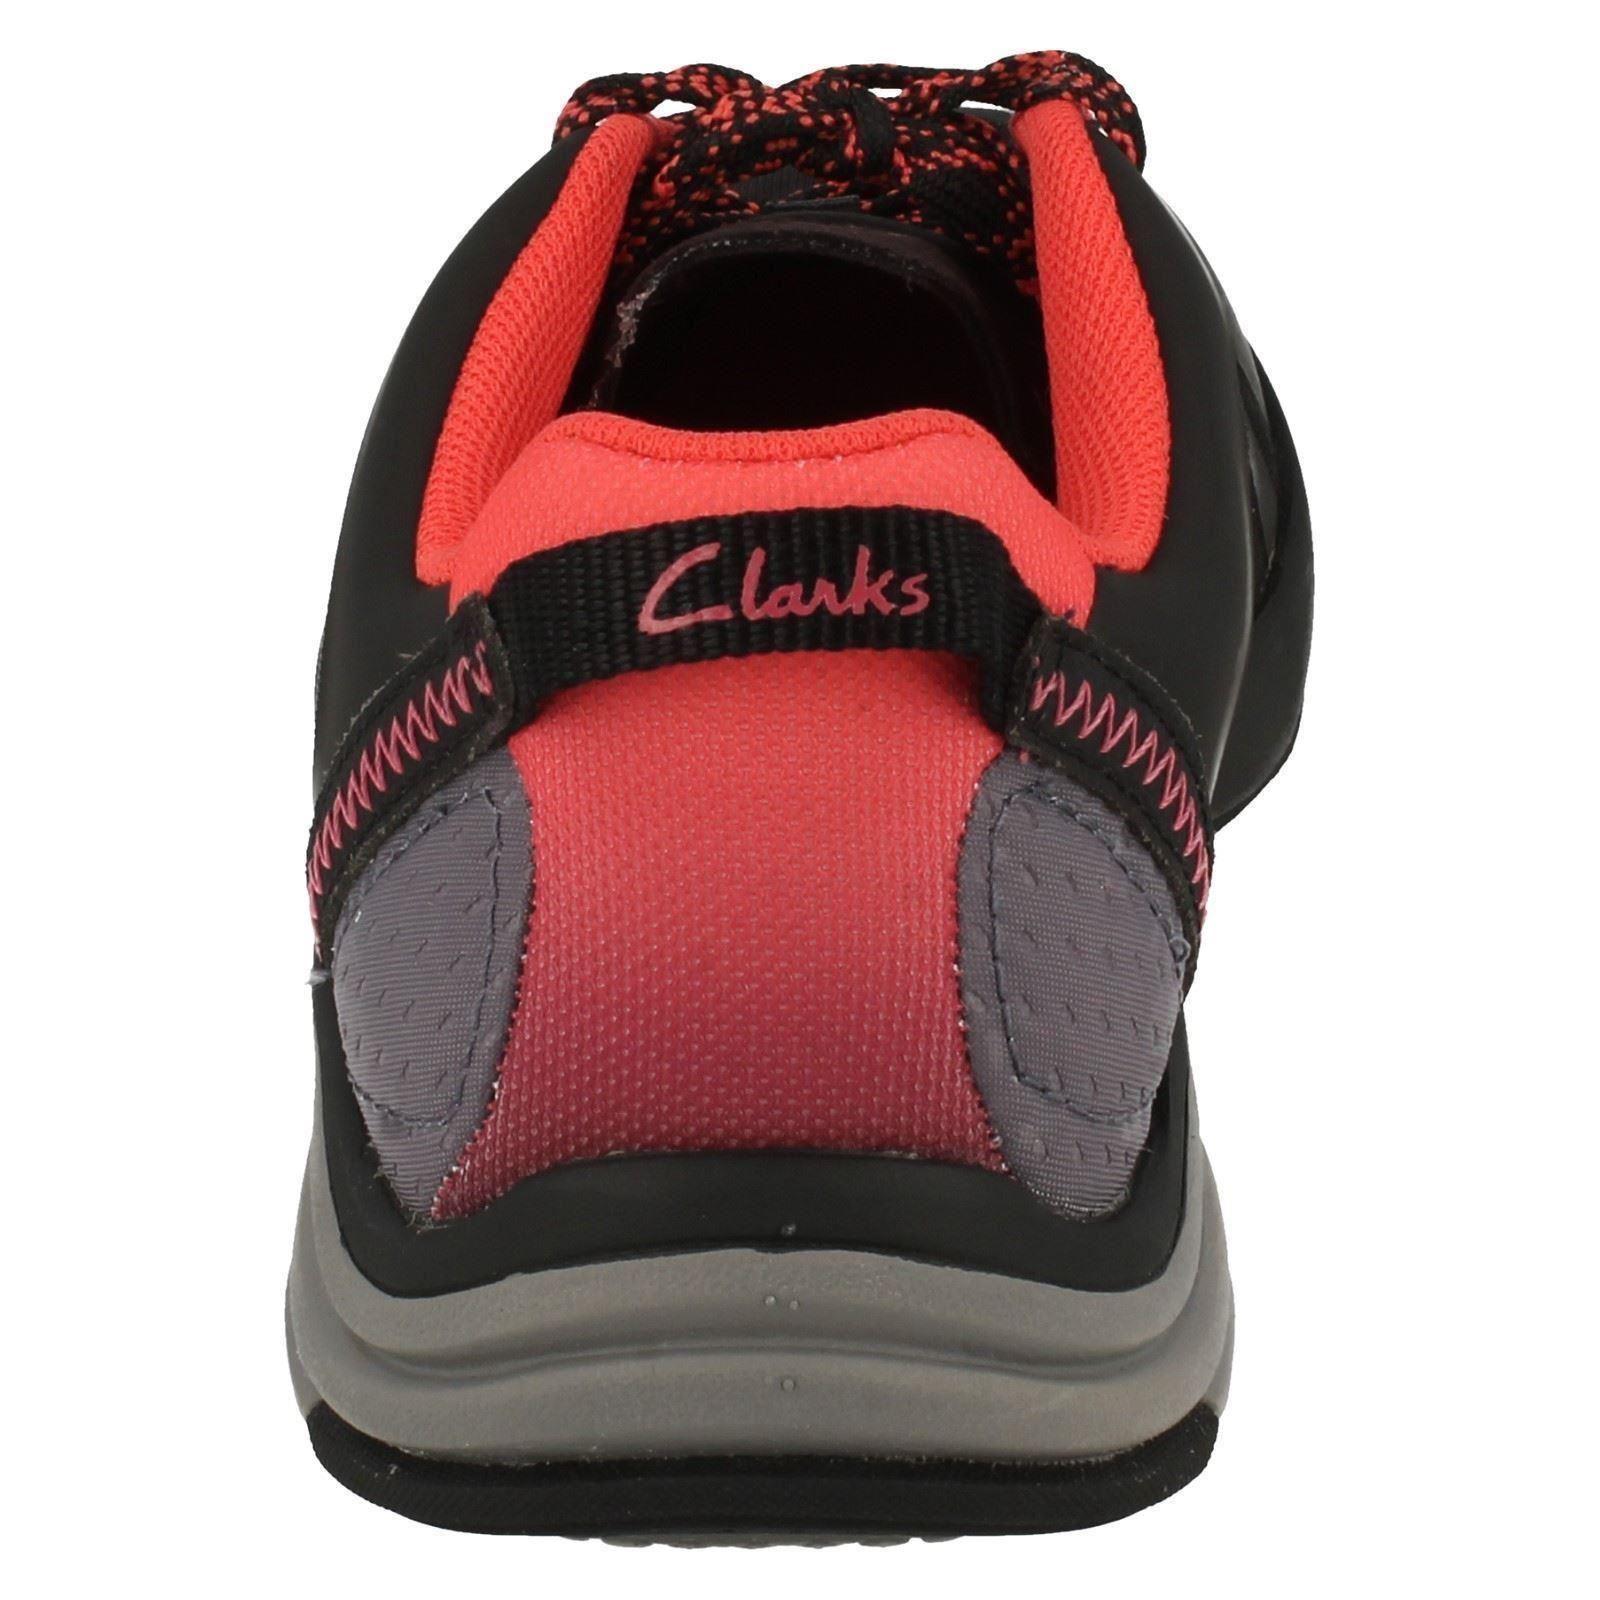 Seoras Clarks Kick Casuals formadores Wave Kick Clarks 8191c9